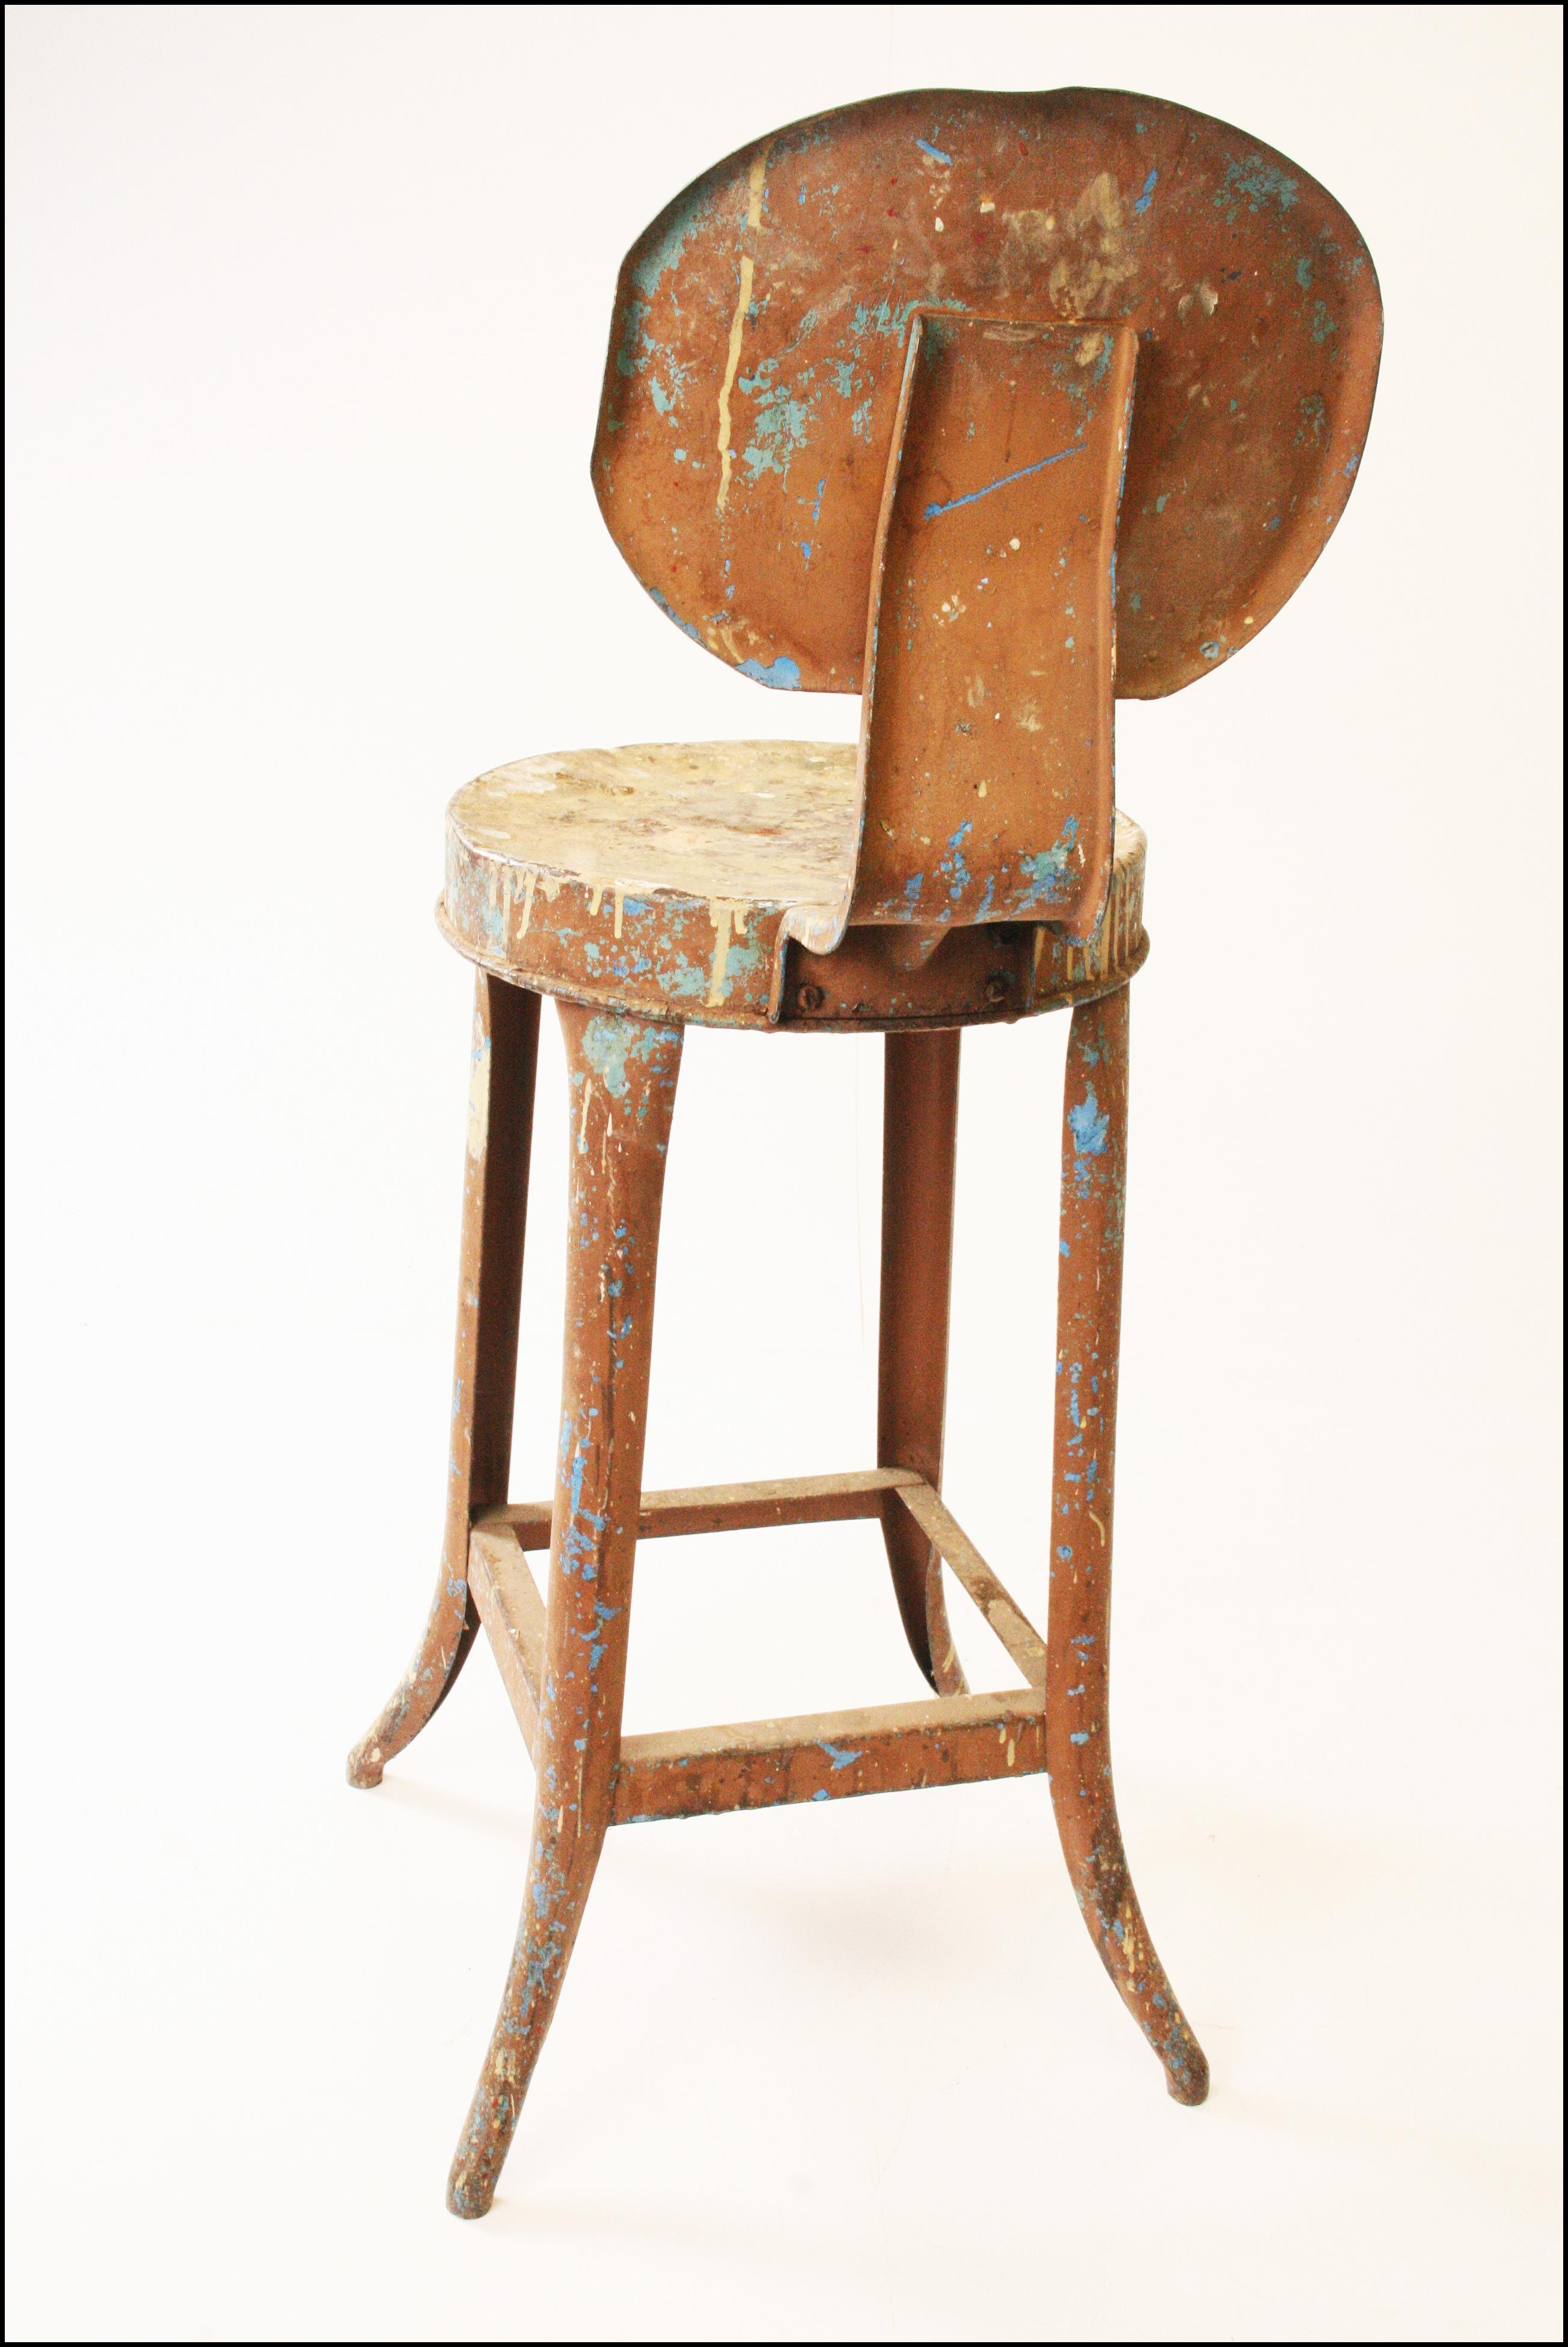 Vintage Industrial Metal Bar Stool Chairish